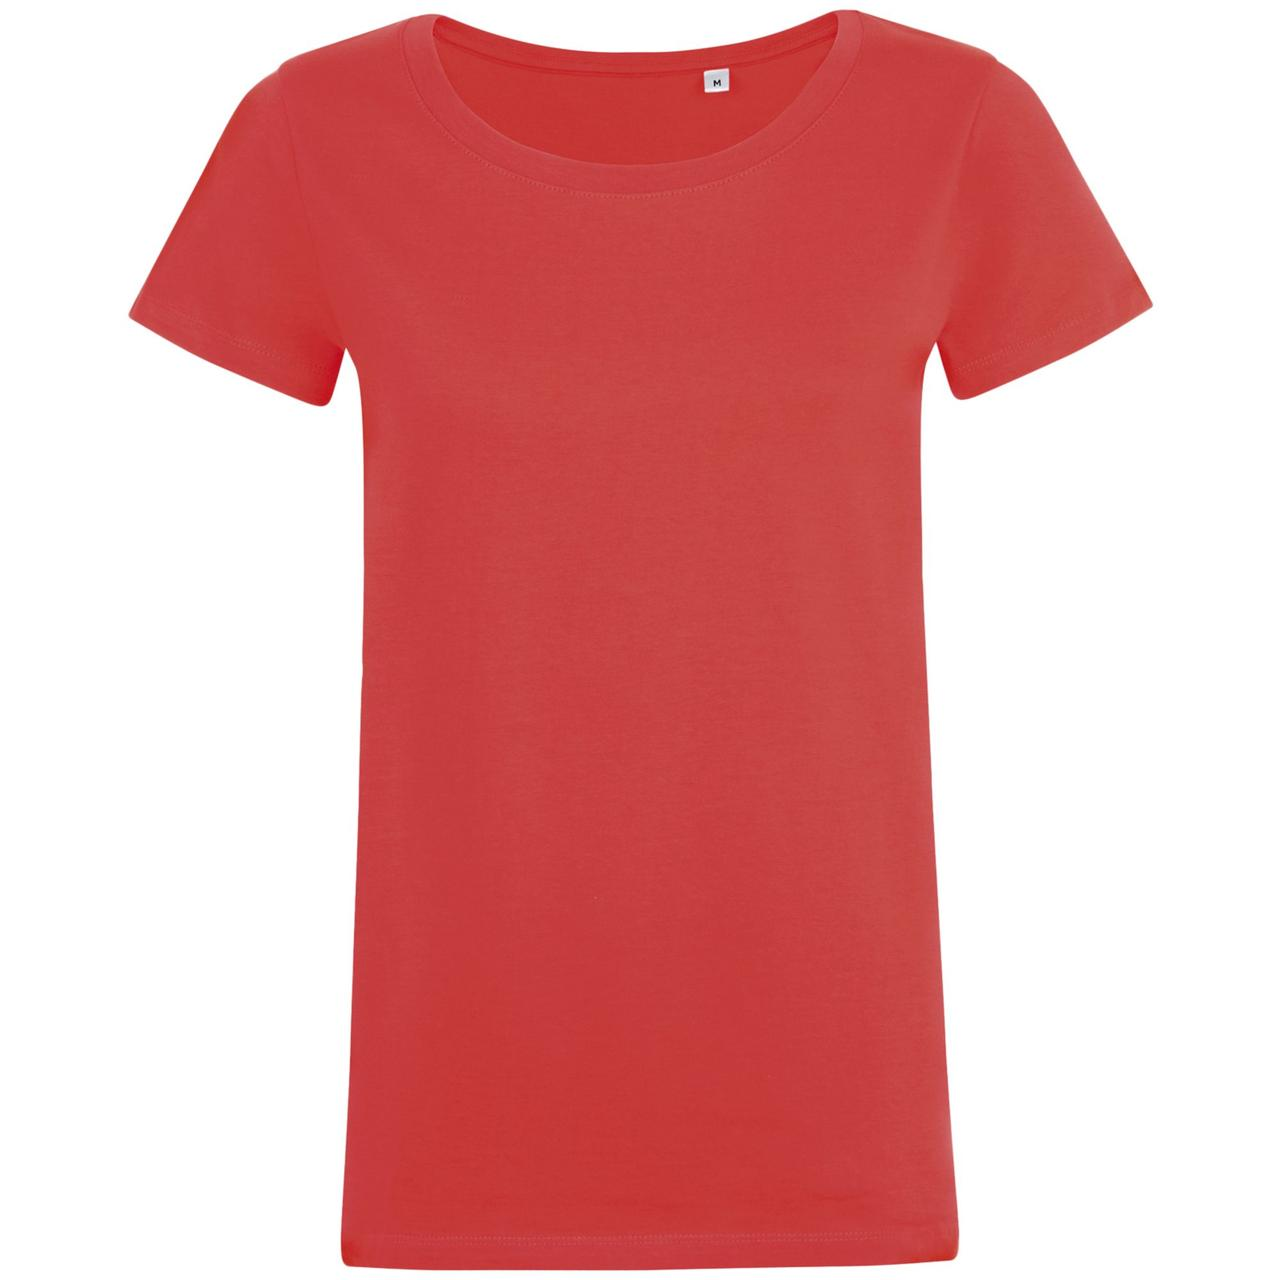 Футболка женская Mia, красная (артикул 01699168)